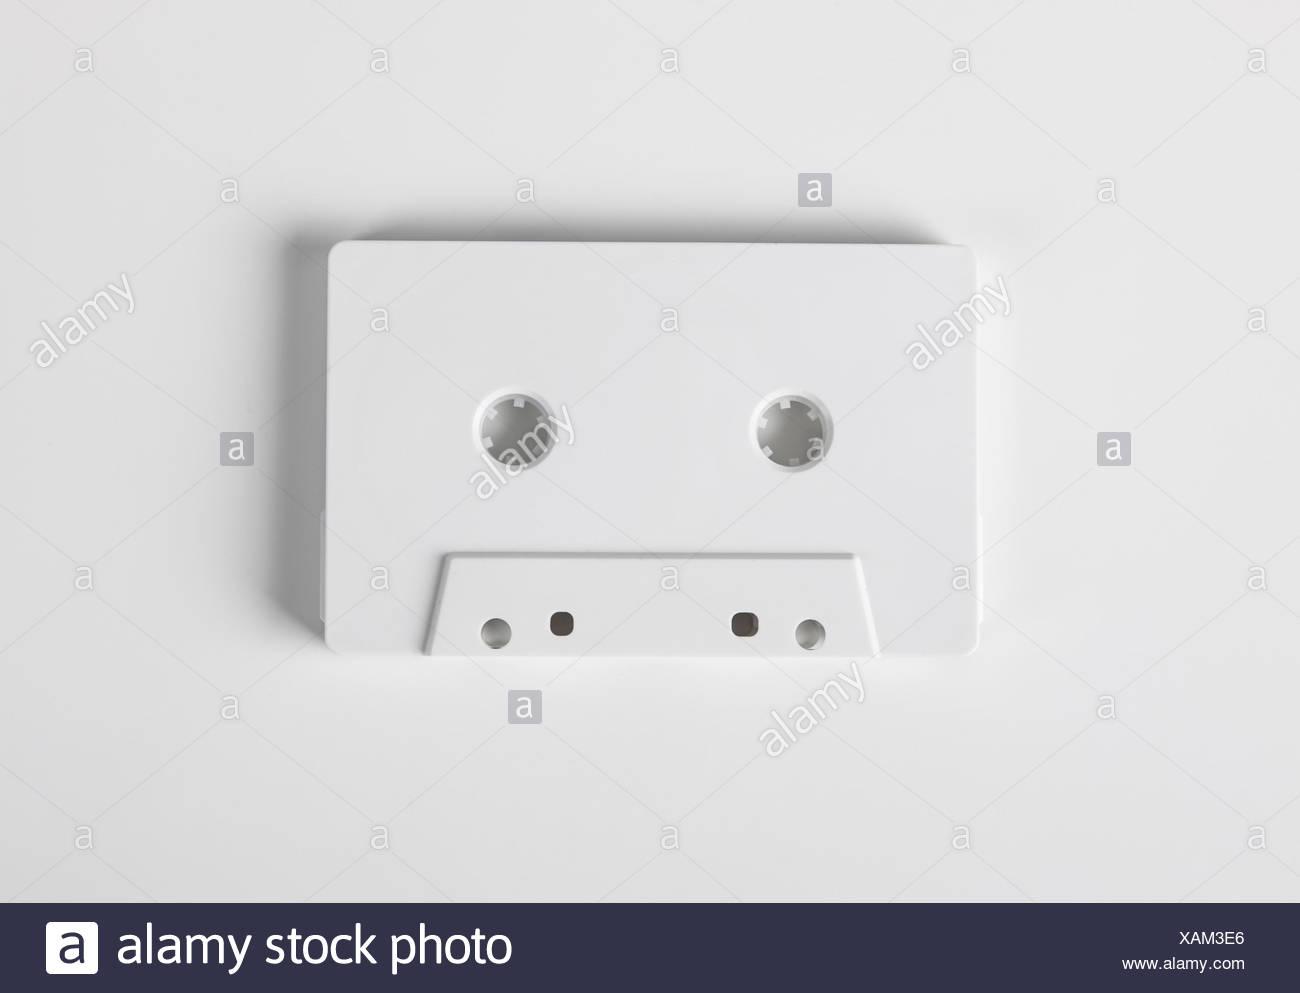 Blank audio cassette on white background - Stock Image